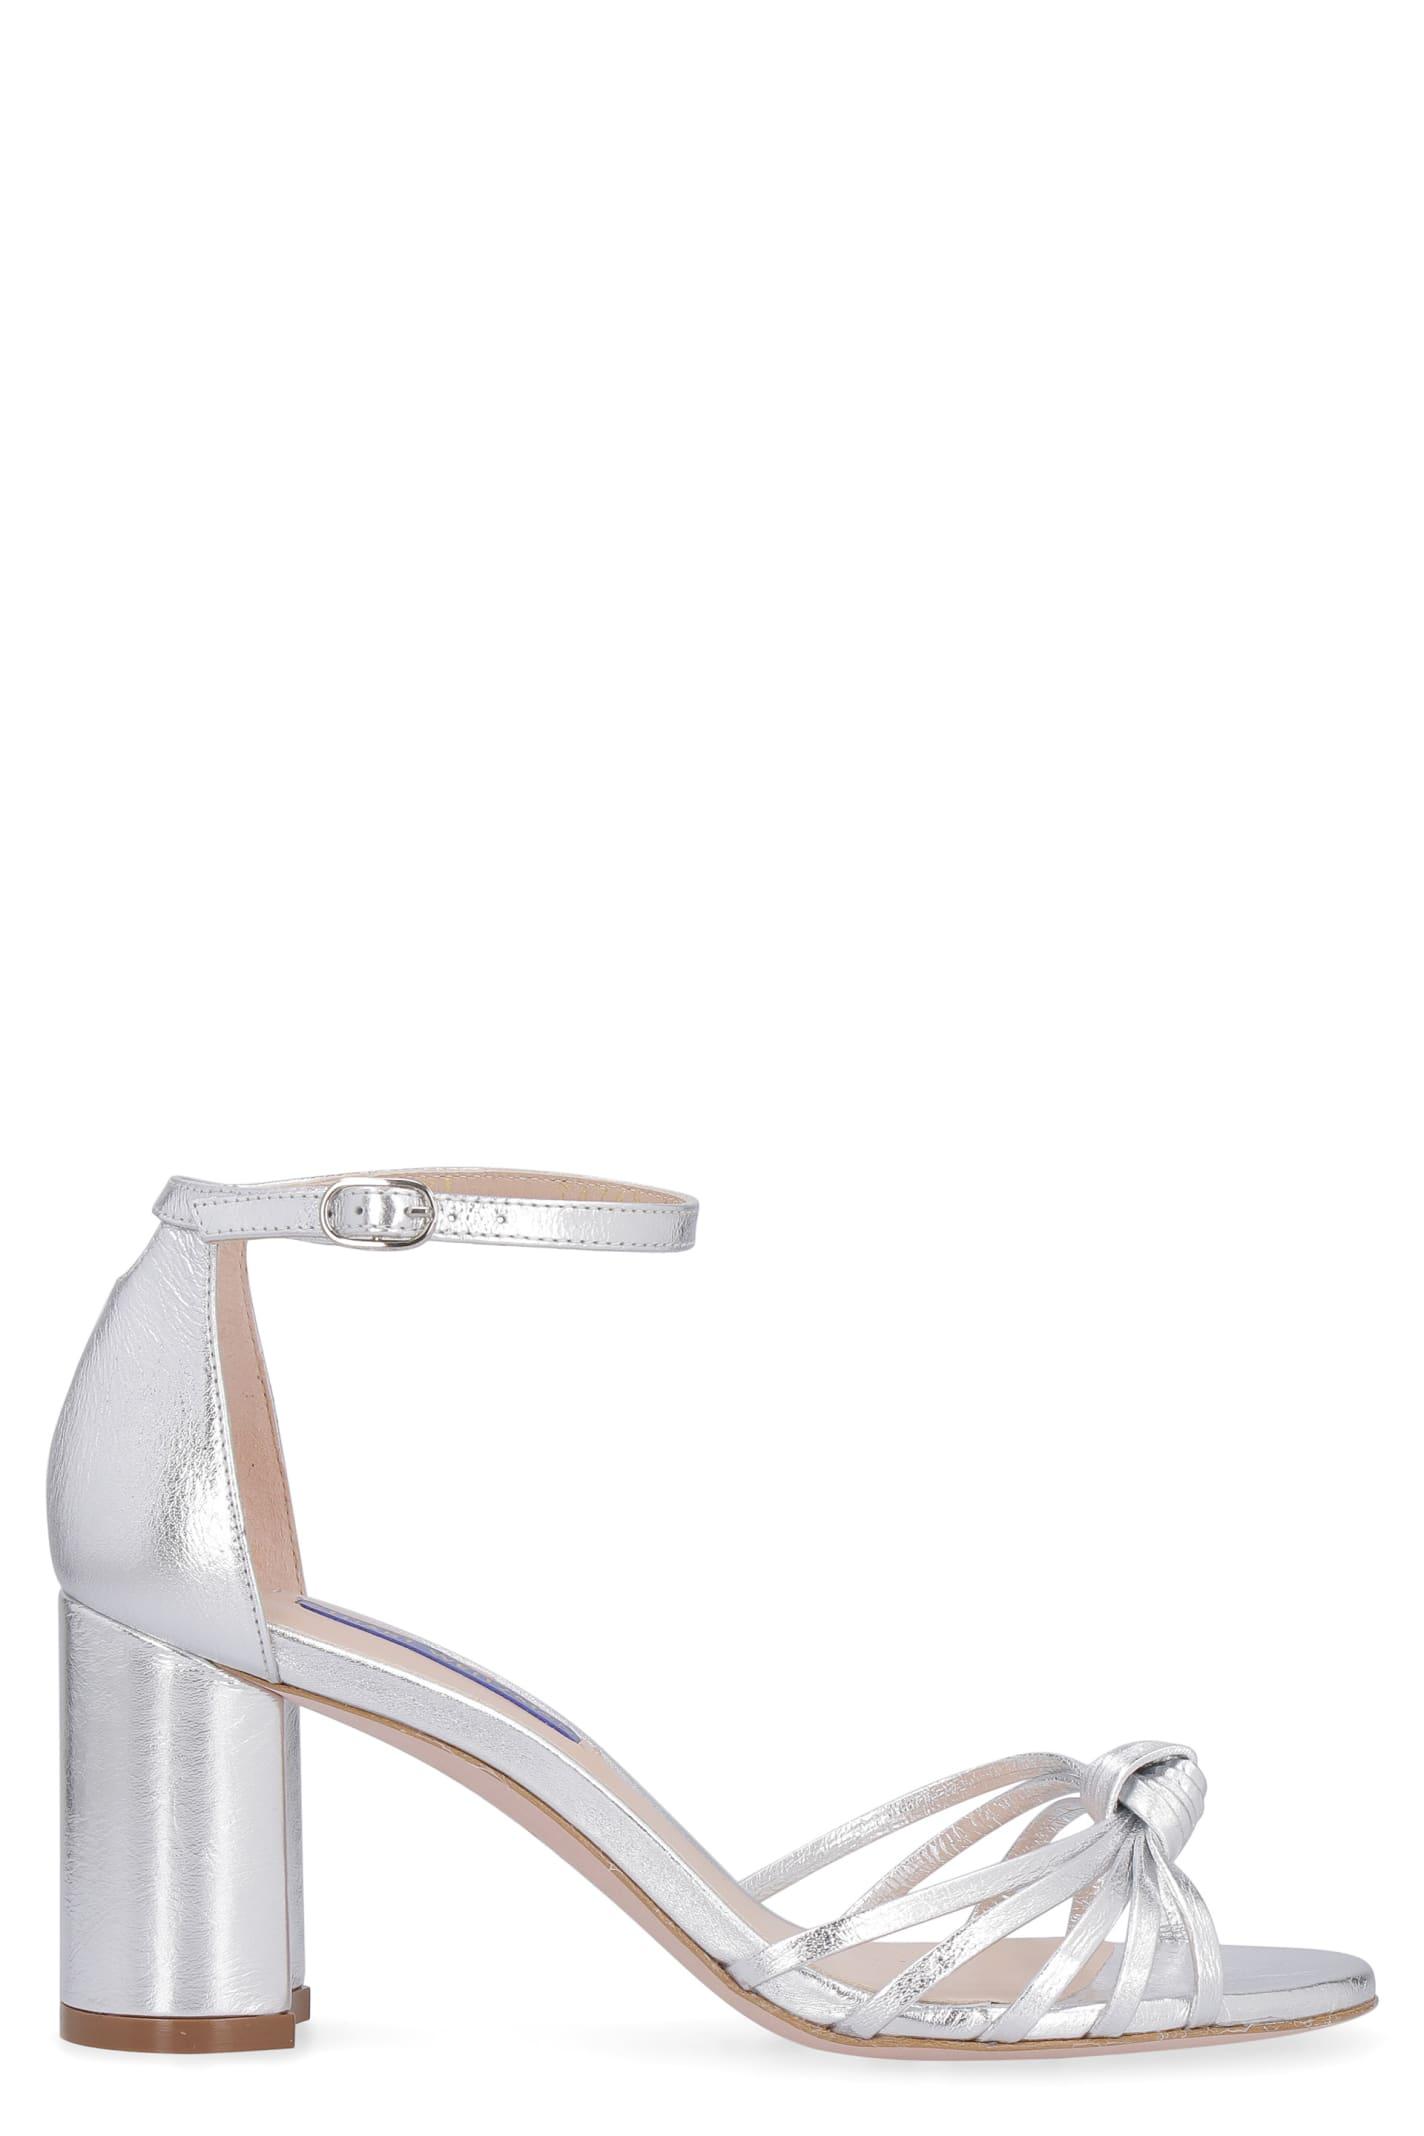 Stuart Weitzman Sutton Metallic Leather Sandals